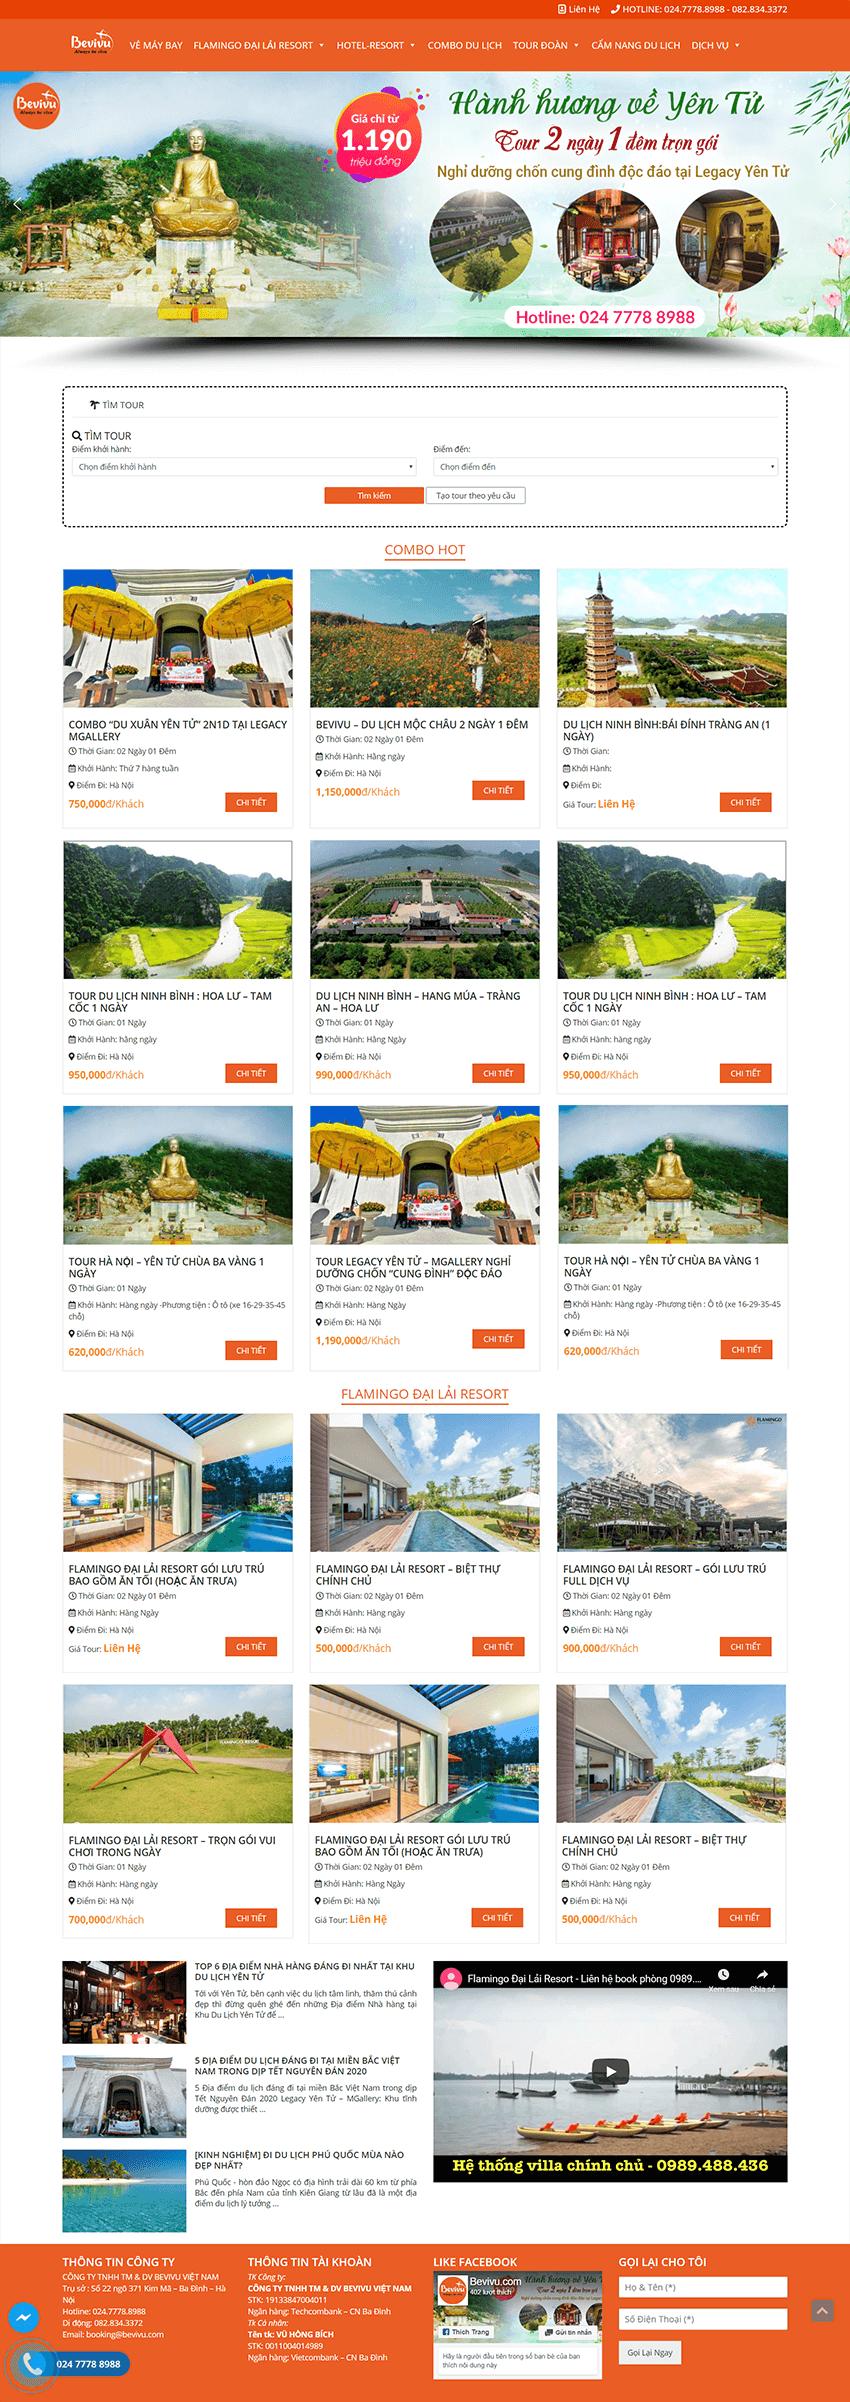 Web du lịch Bevivu